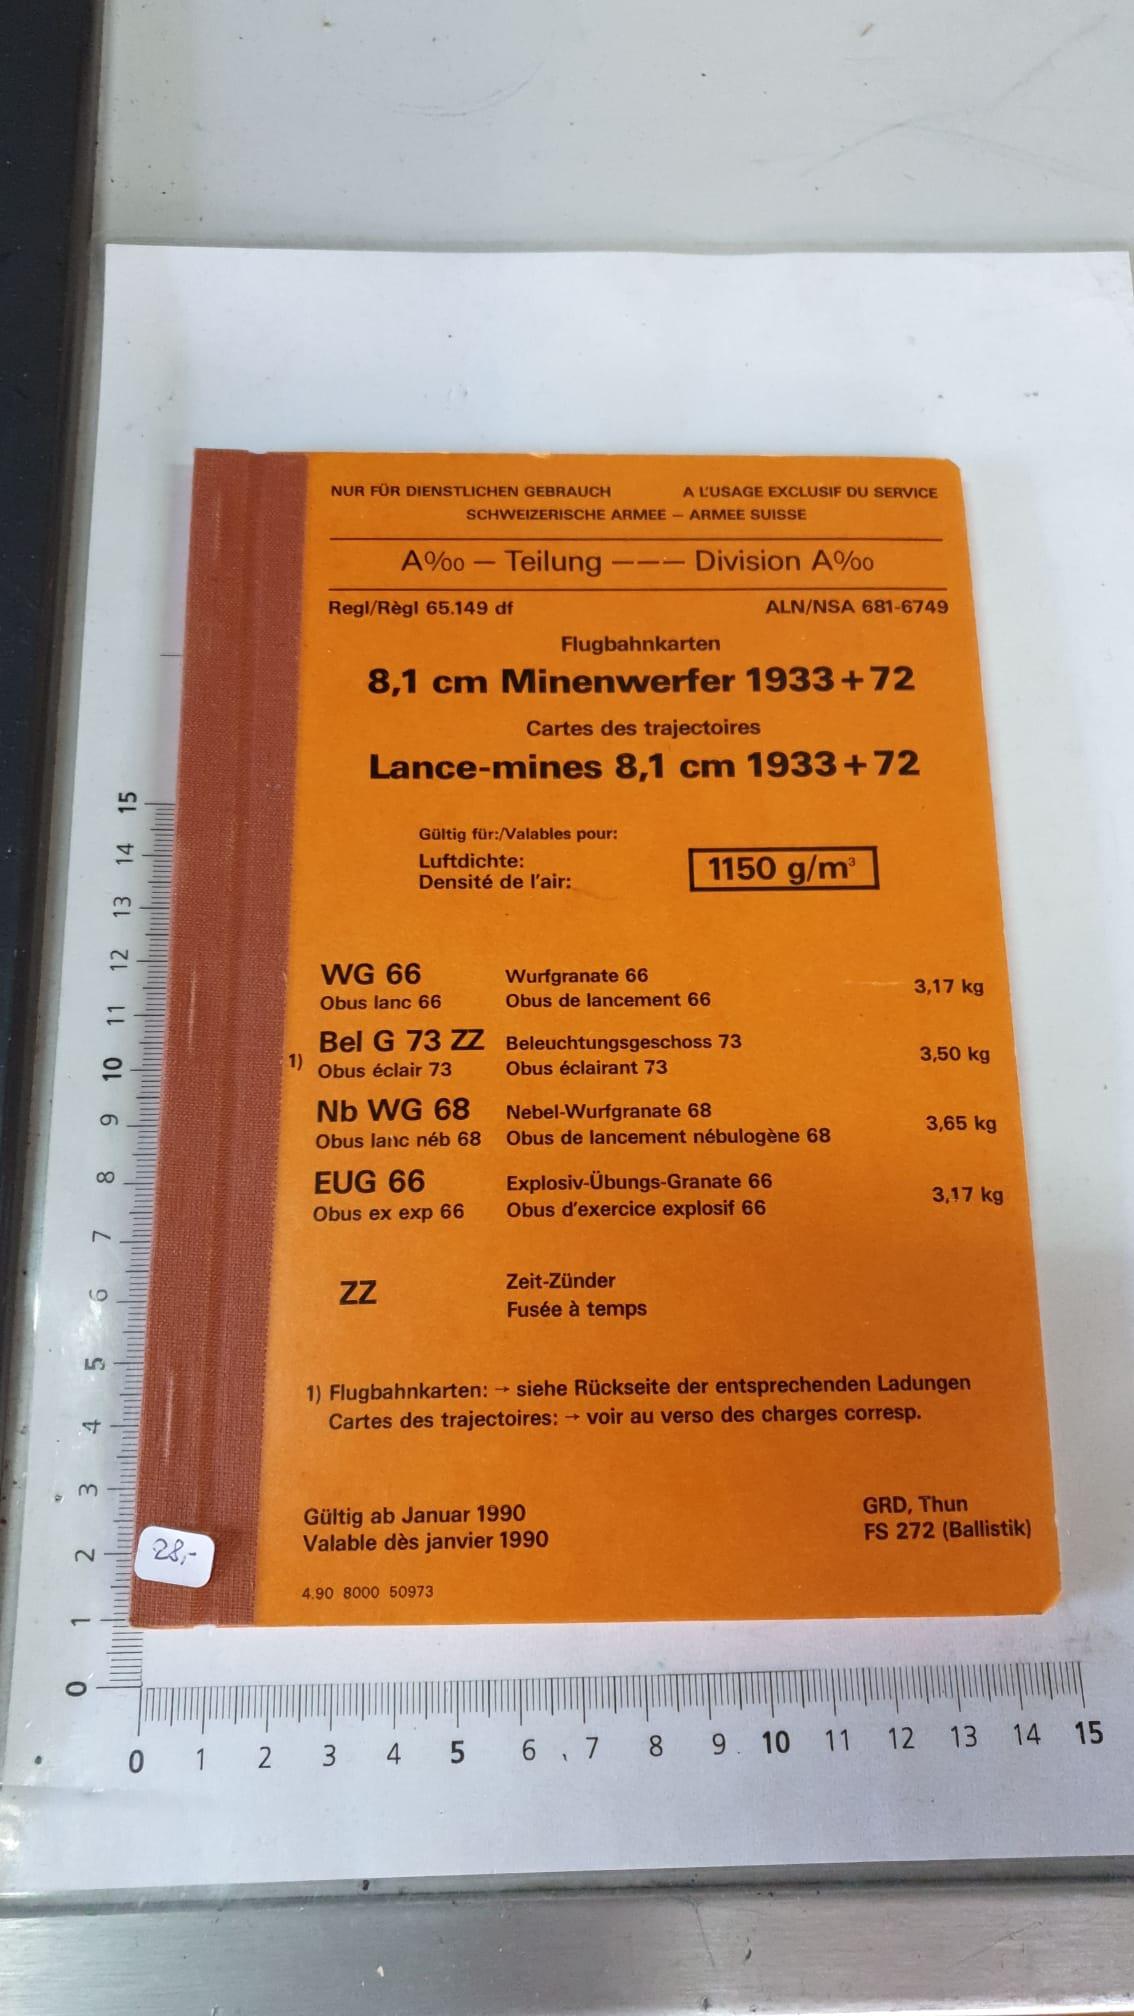 Flugbahnkarten Ch Armee 8 1 Cm Minenwerfer 1933 72 Waffen Schweizer Armee Military World Shop Ch